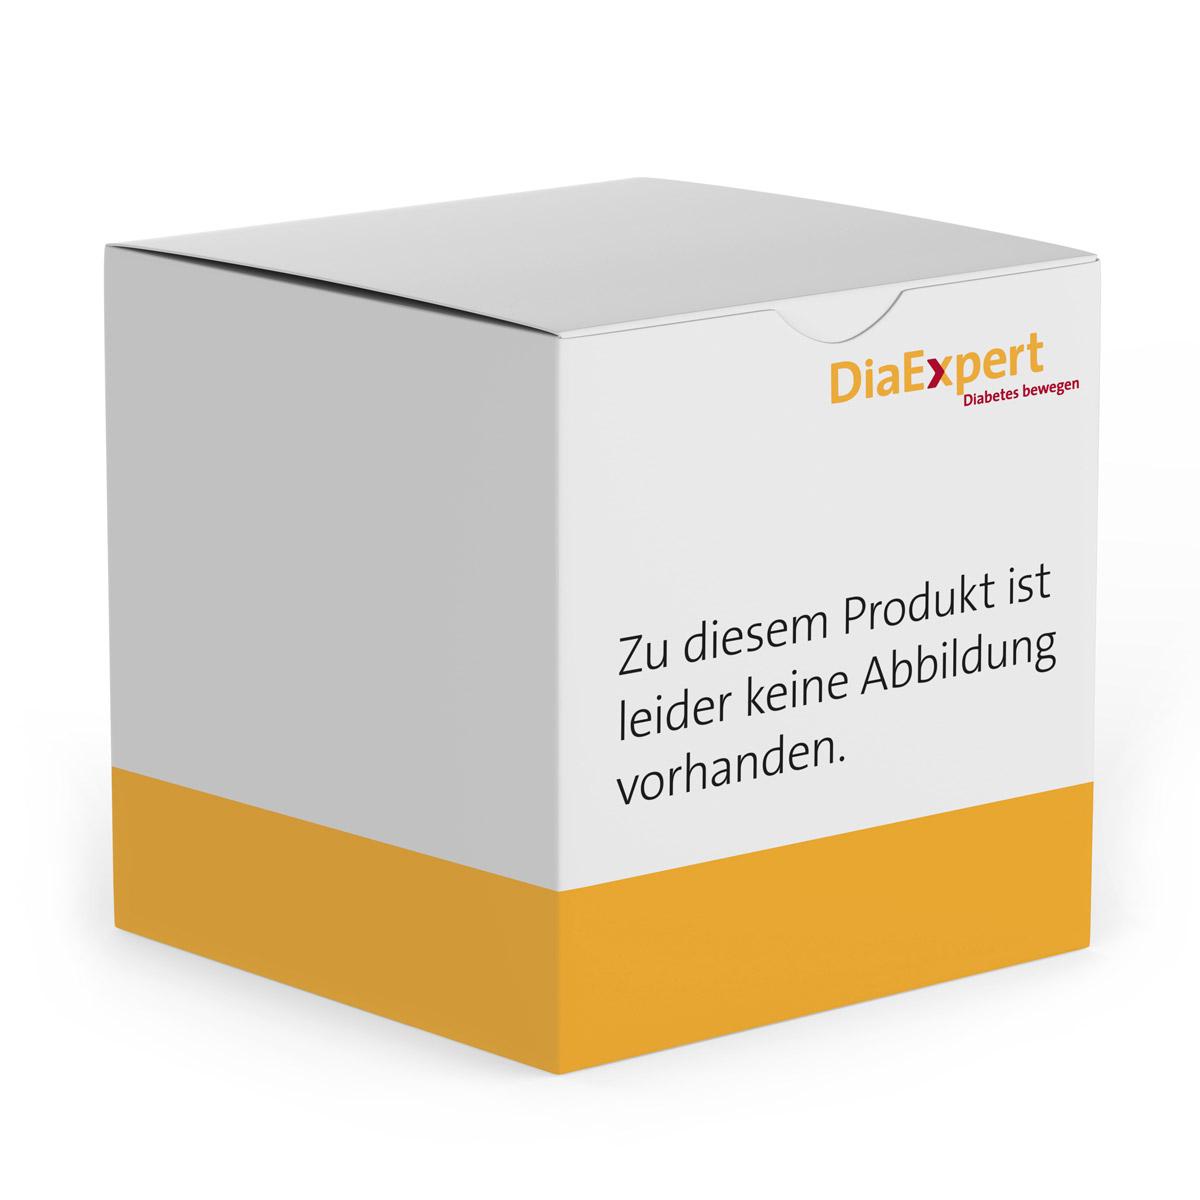 BD AutoShield Duo 0,3 x 8 mm 100 Stück